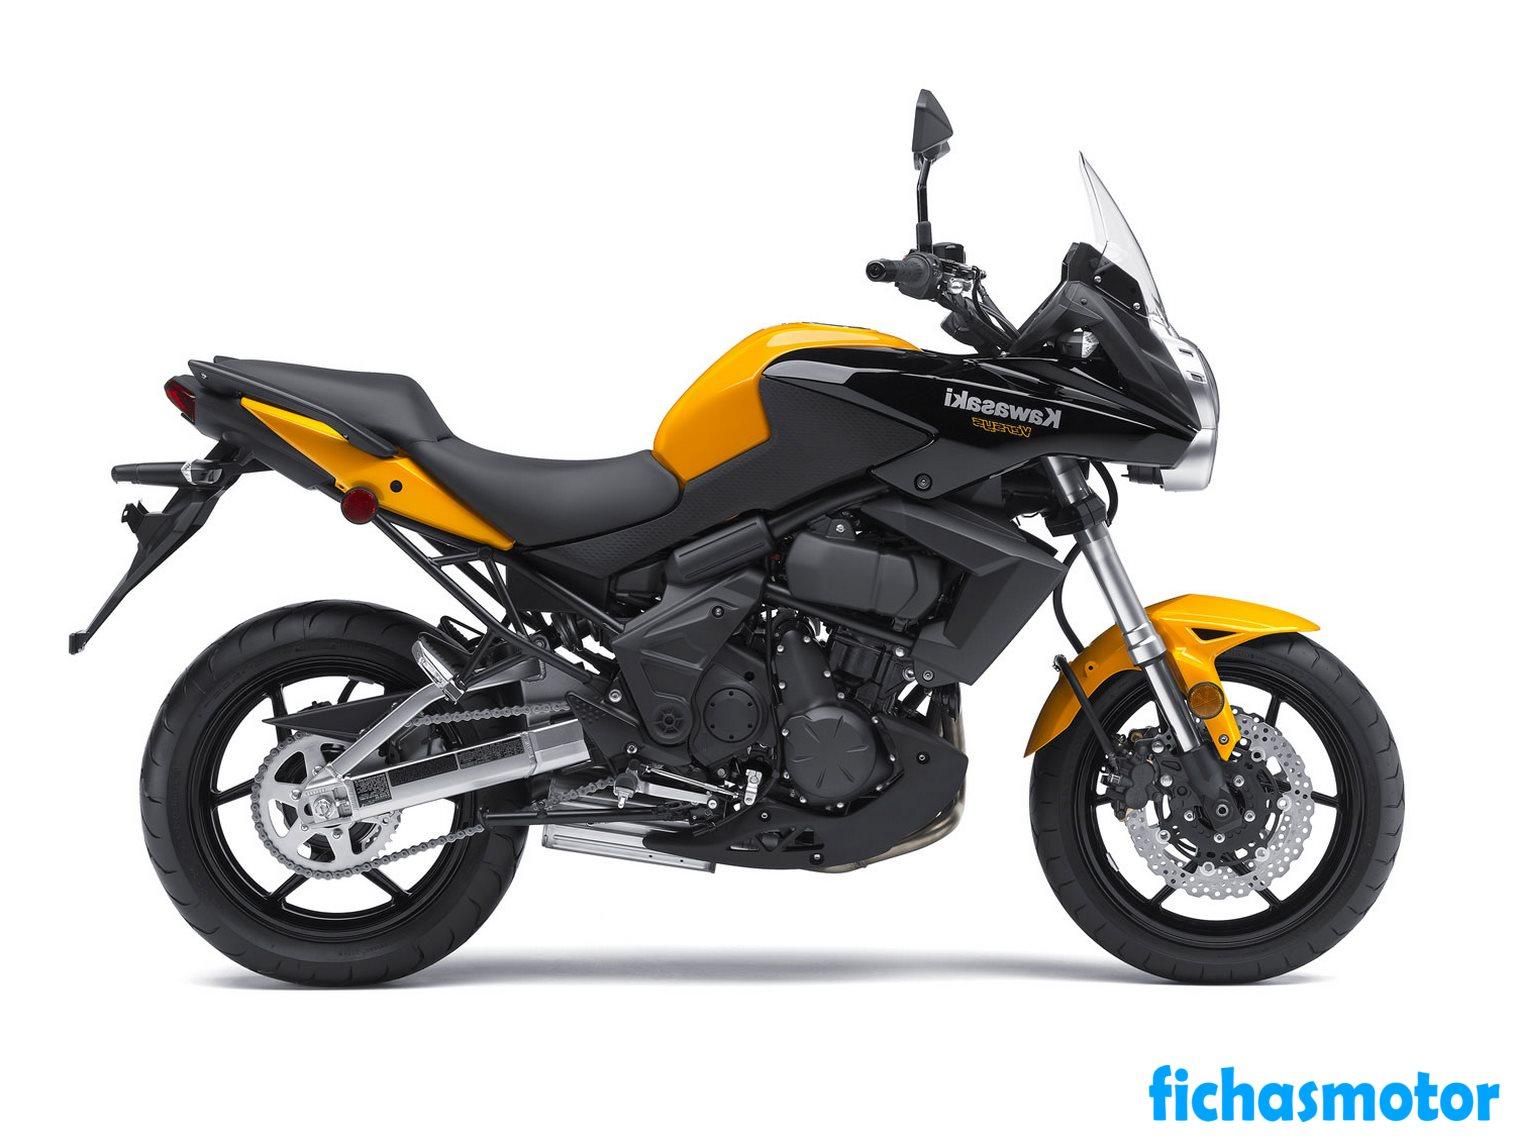 Ficha técnica Kawasaki versys 650 2012